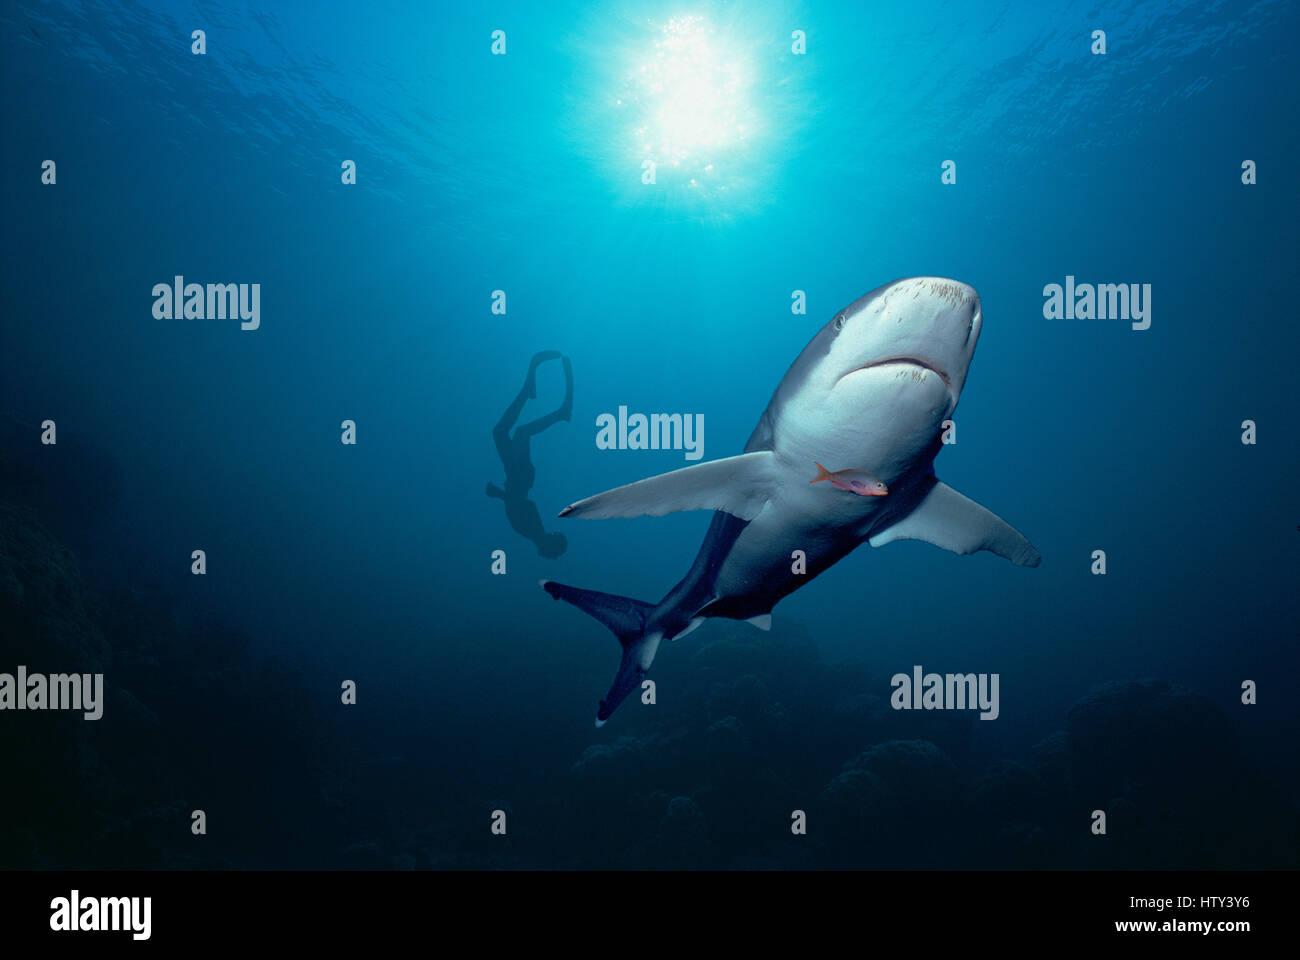 Silvertip Shark (Carcharhinus albimarginatus) and diver. Cocos Island, Costa Rica - Pacific Ocean. Image digitally - Stock Image